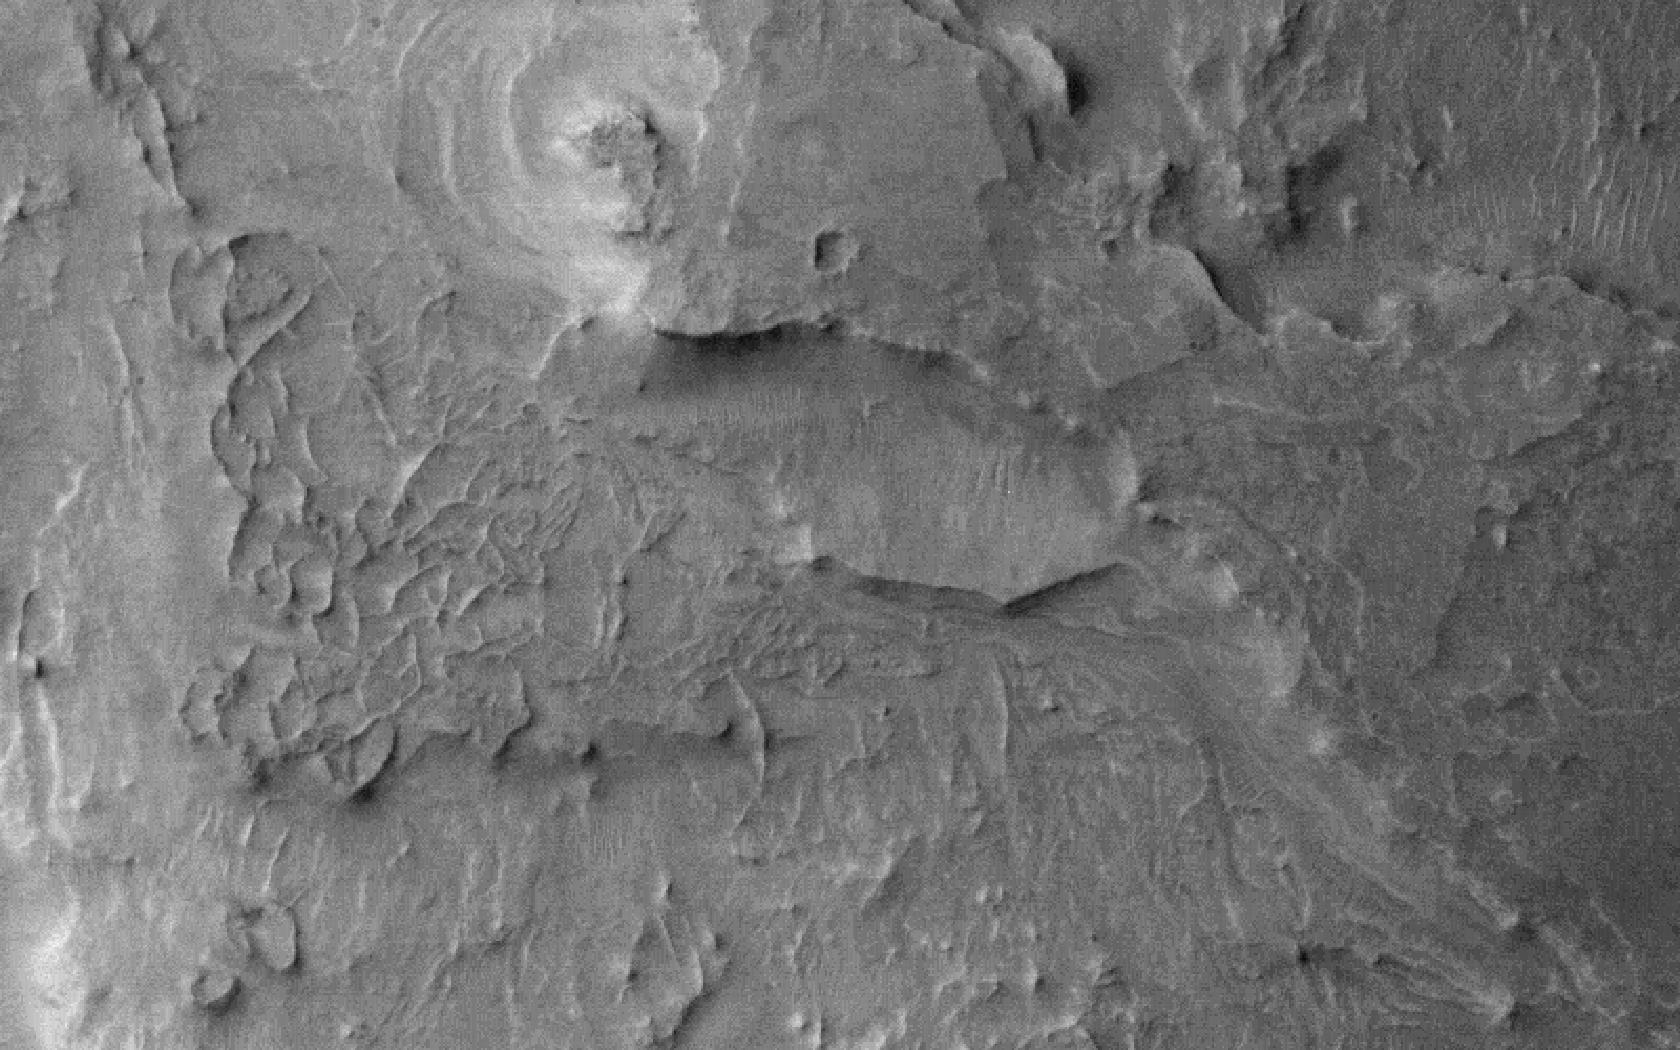 Mars Landscape - Image 002b